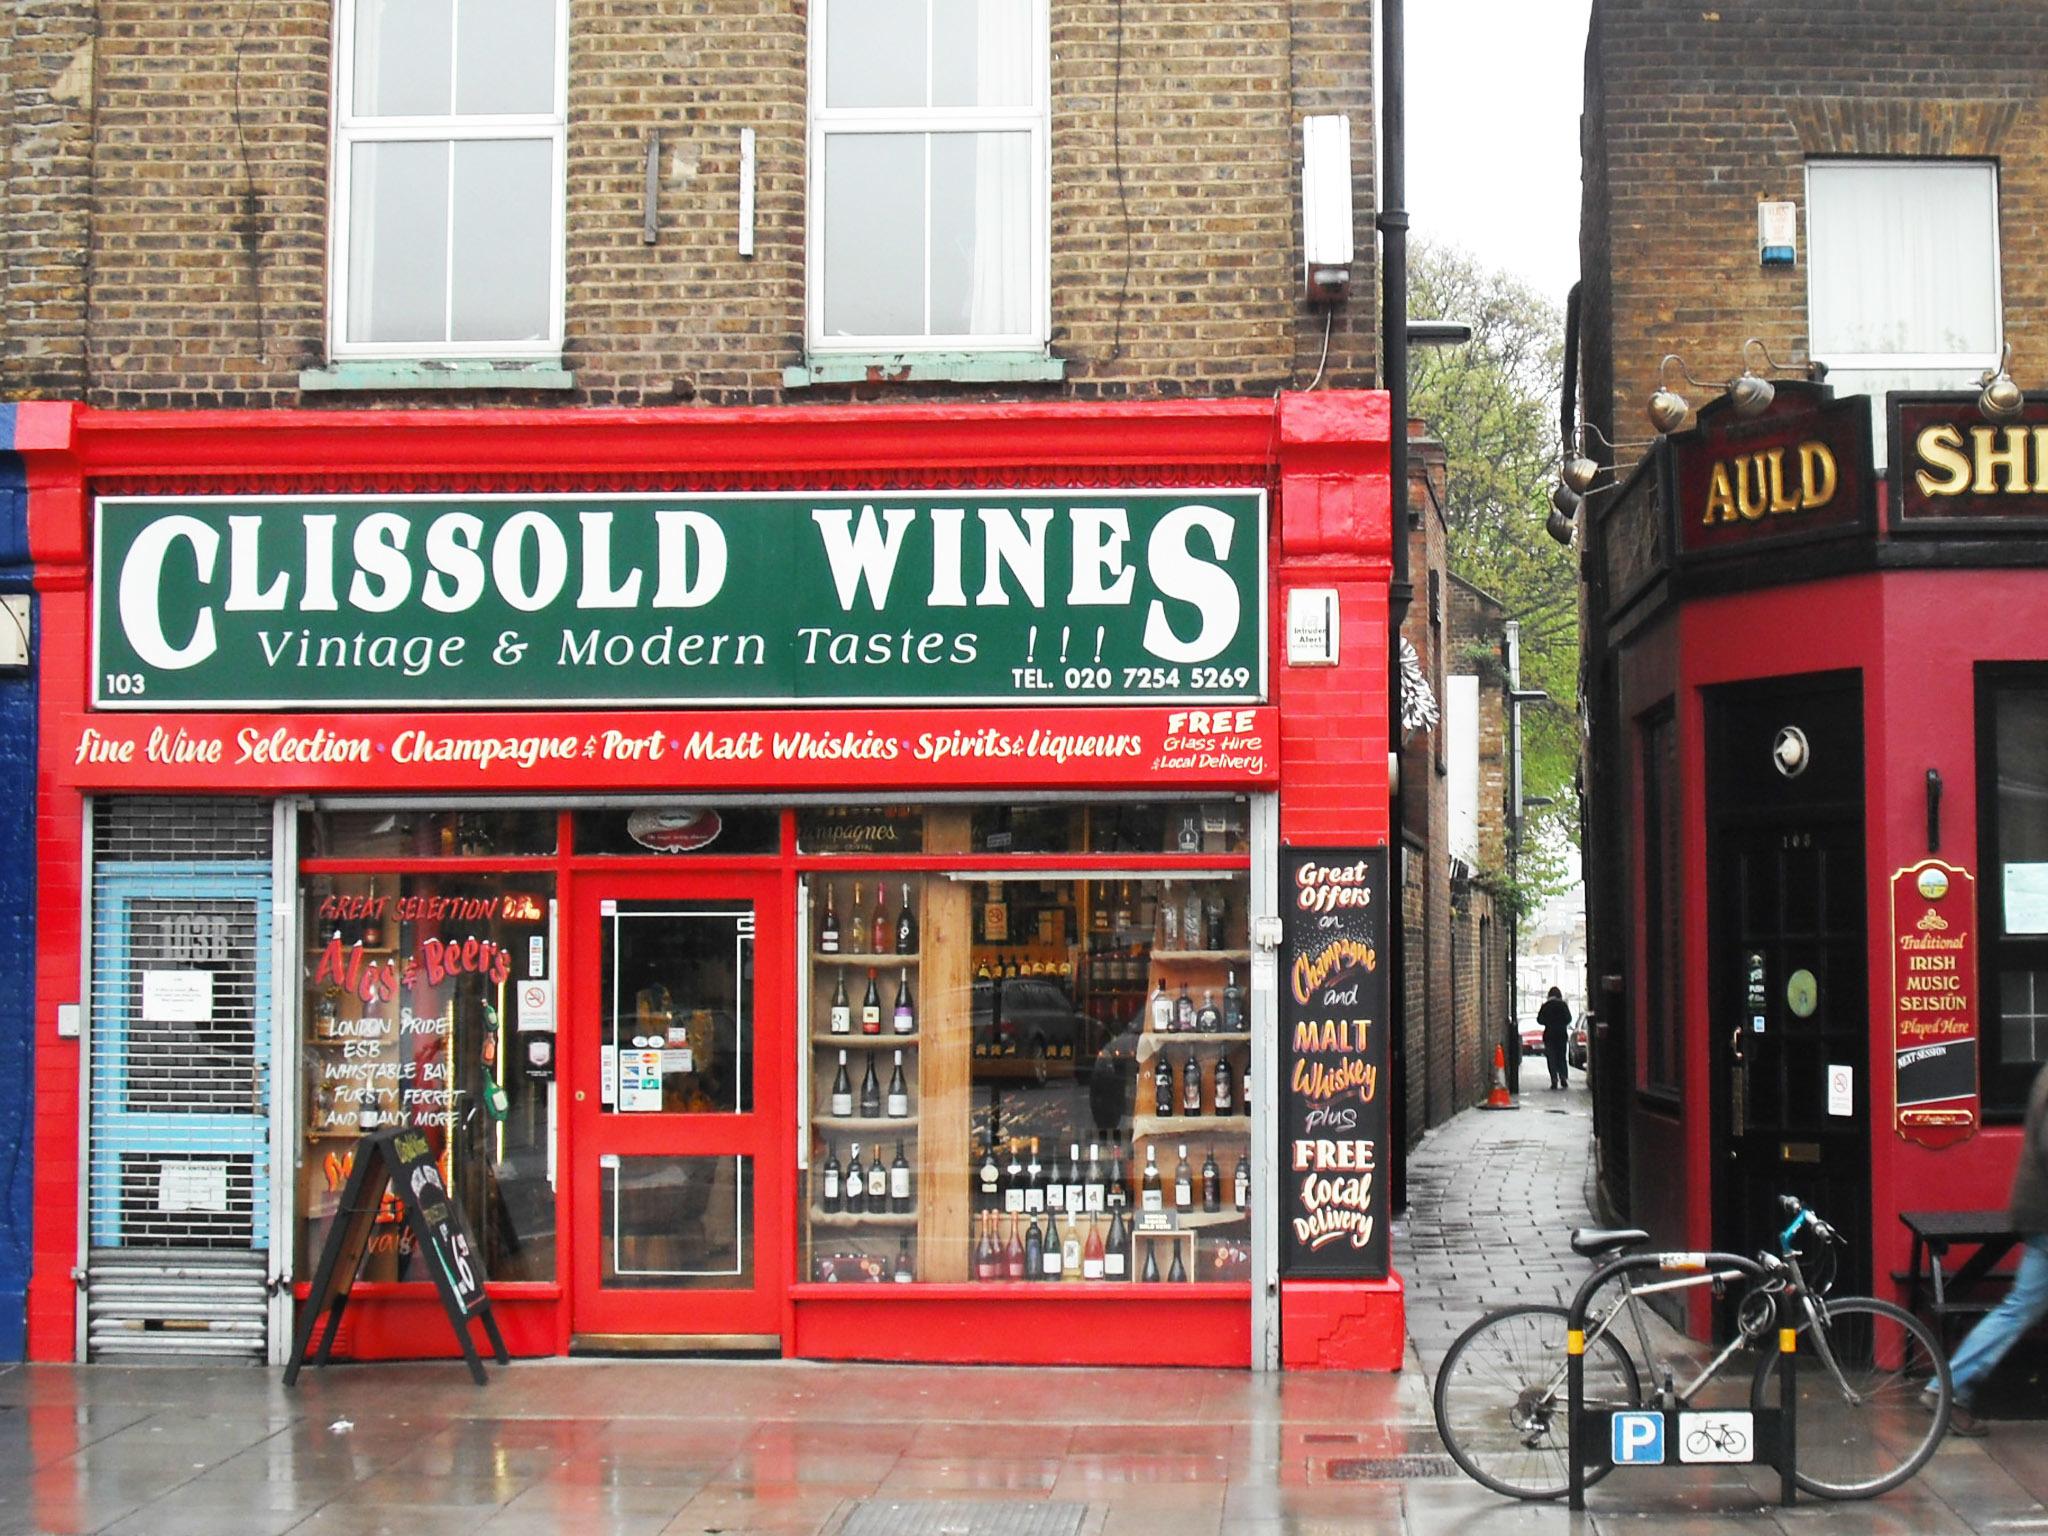 Clissold Wines Stoke Newington Church Street